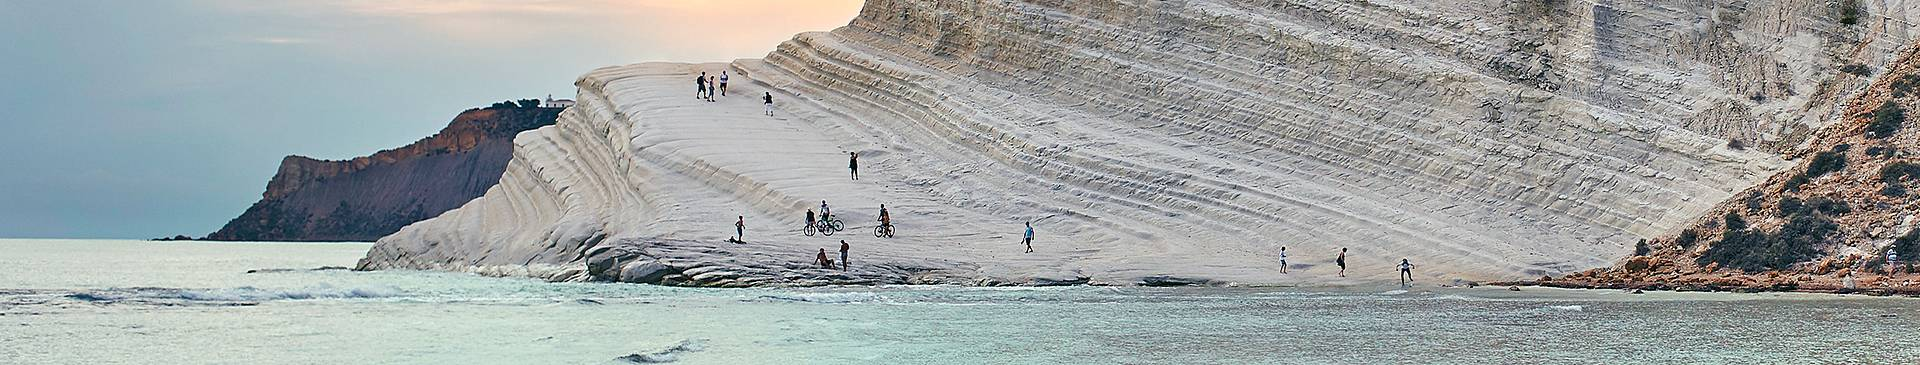 Voyage plage en Sicile